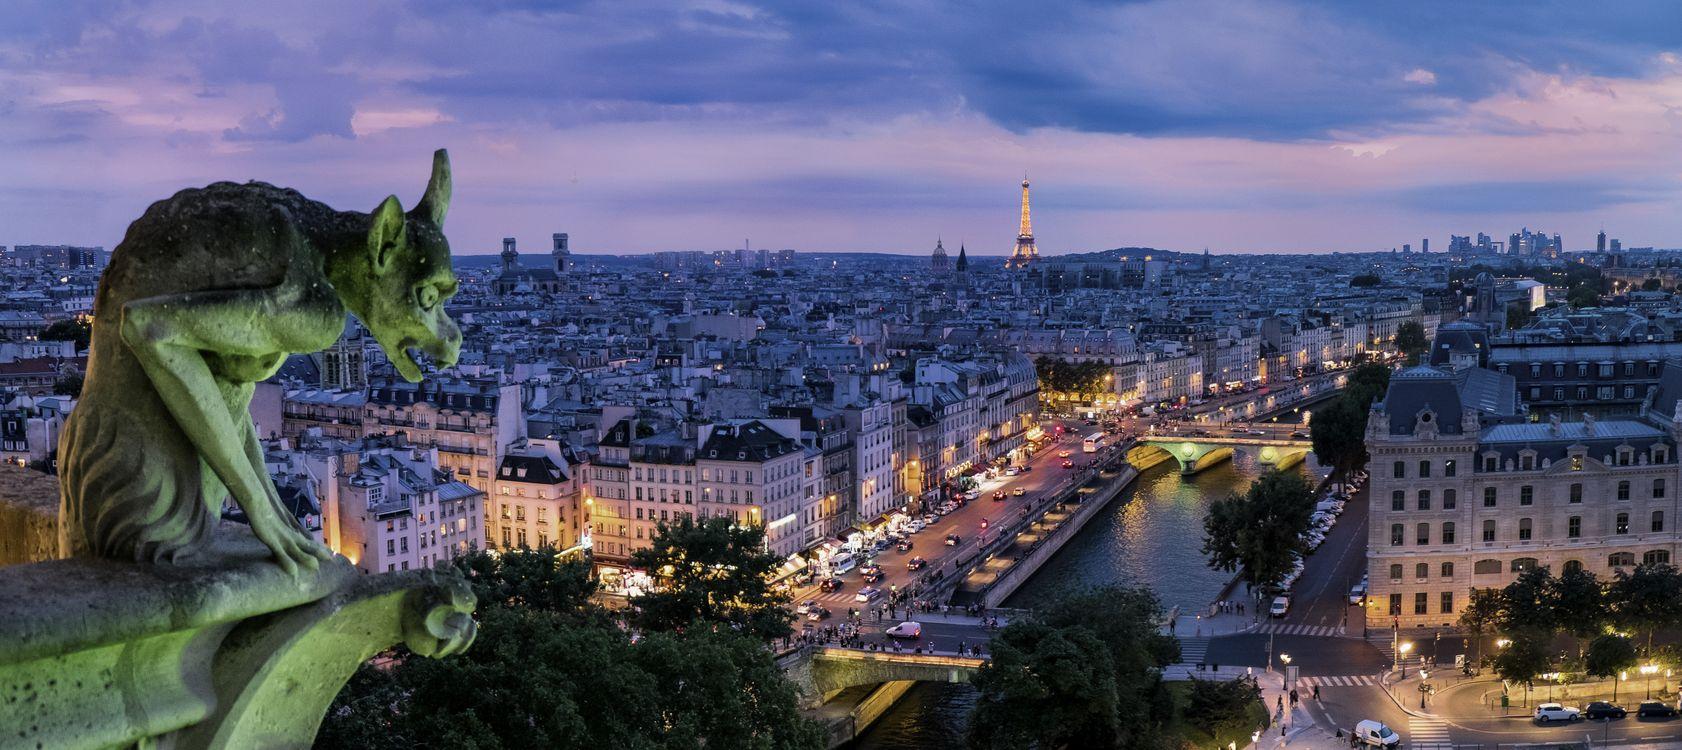 Фото бесплатно Франция, панорама города, Париж - на рабочий стол